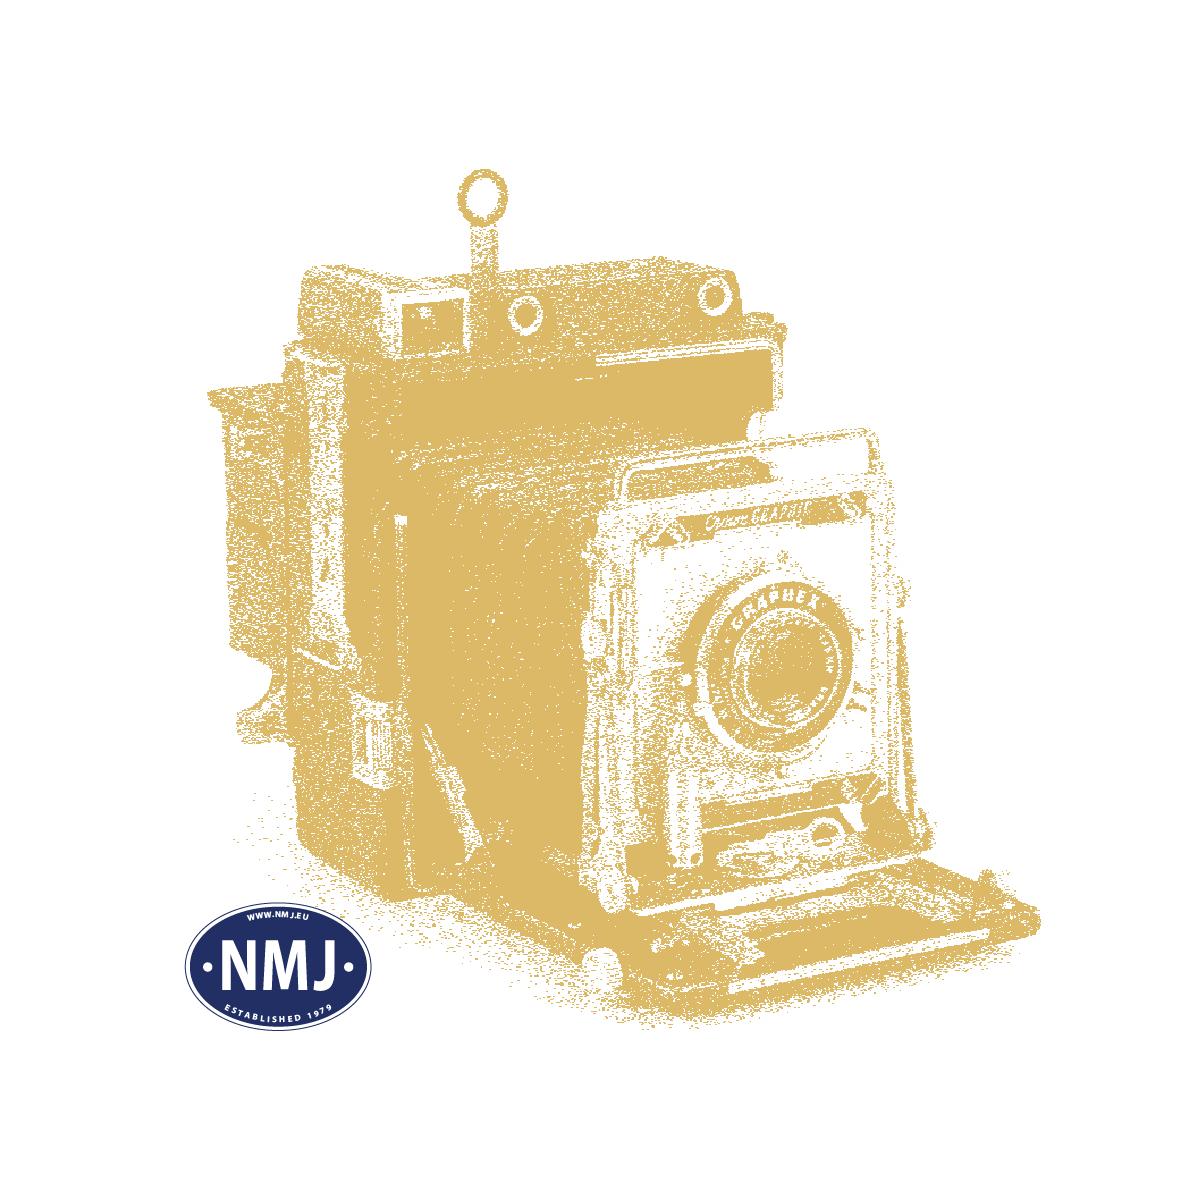 NMJT93005 - NMJ Topline SJ YF1 1325, Orange, DCC m/ Sound